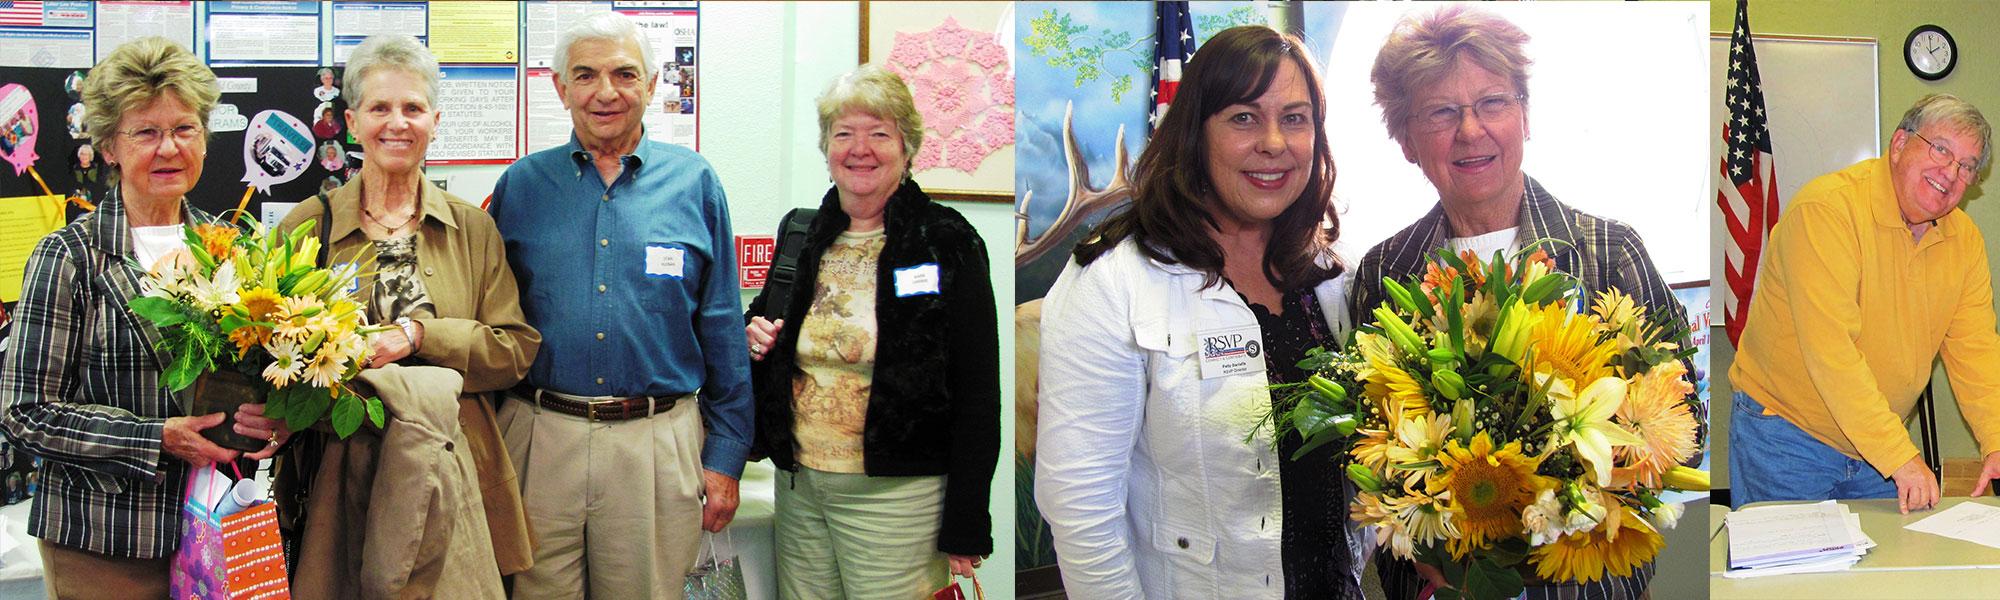 High Country RSVP Volunteer Programs and Volunteer Positions